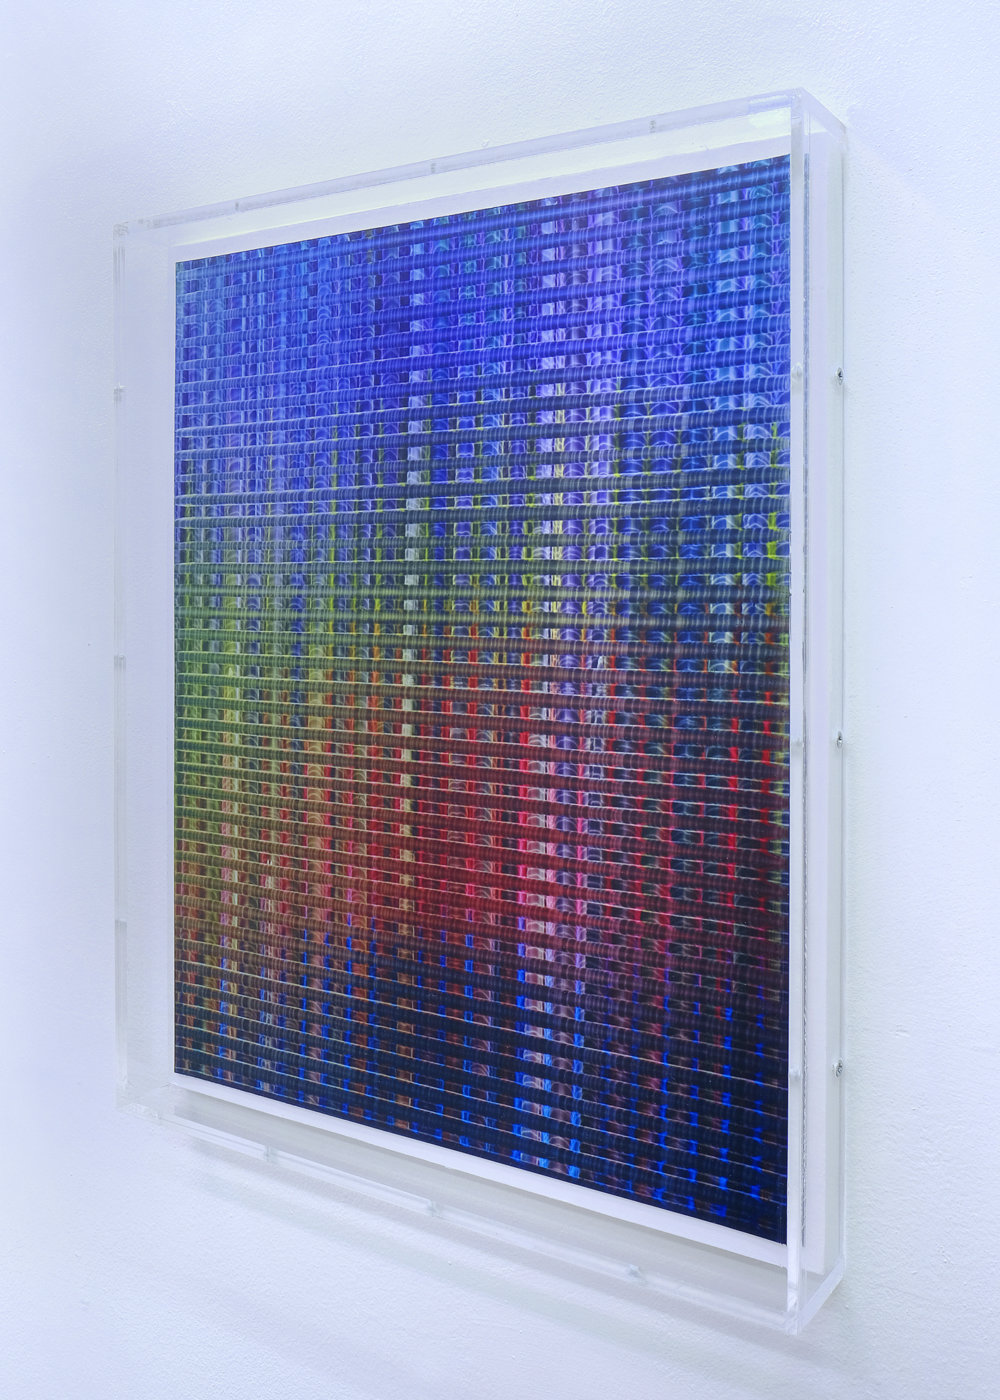 2 R Bouwman SFP0220 31.9×24.9cm (550 euro) oil on papier, in perspex lijst, 2021